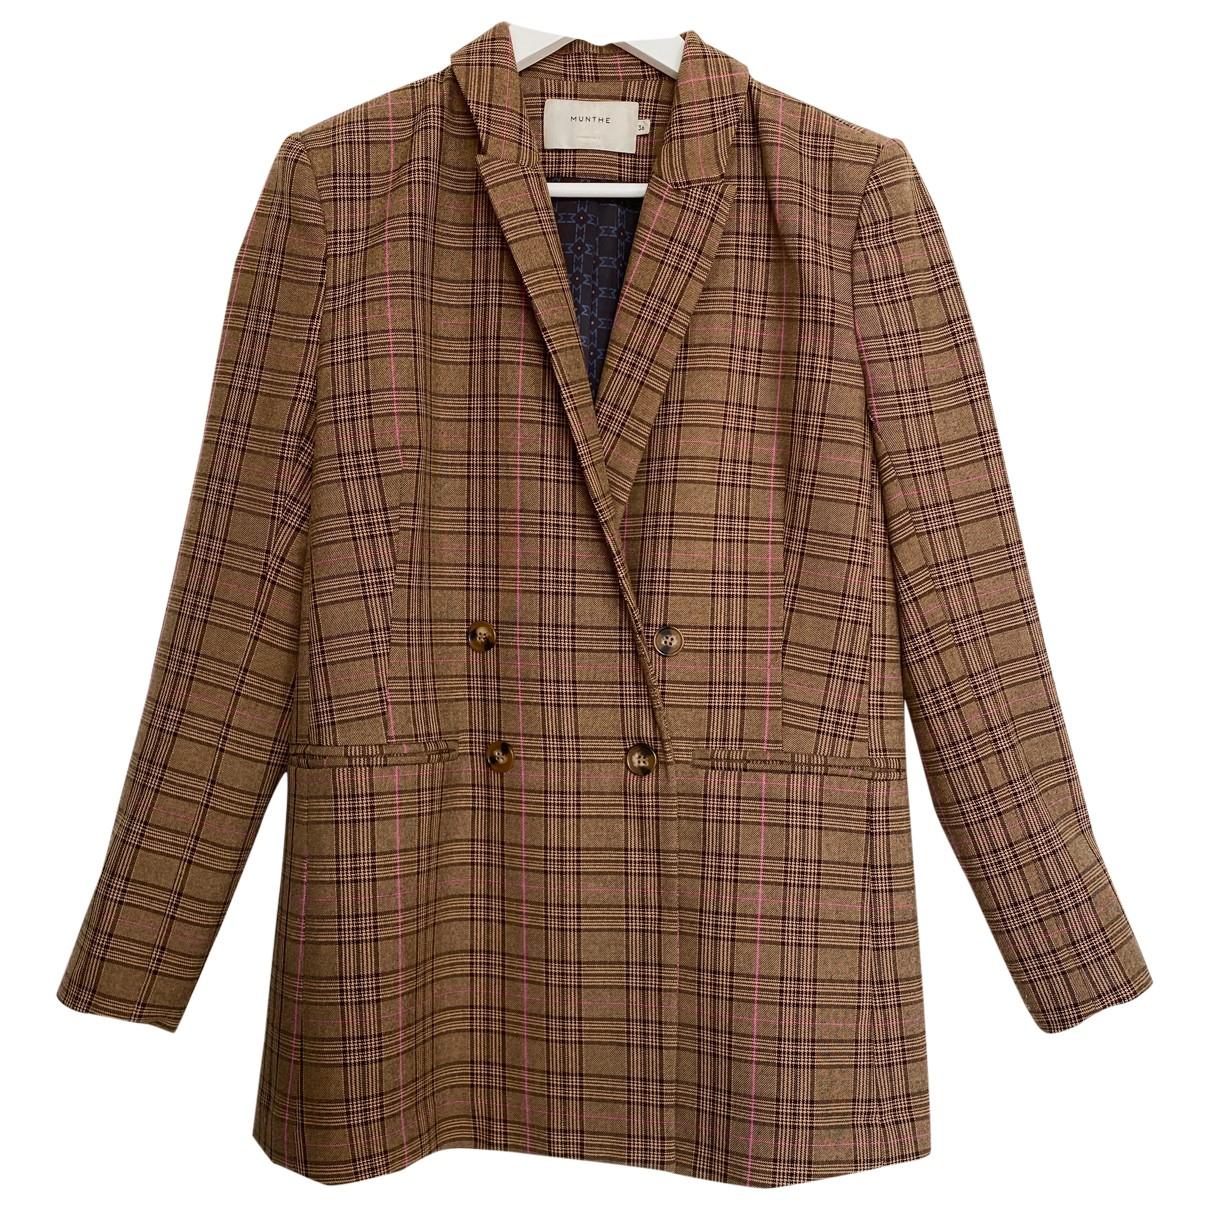 Munthe \N Brown jacket for Women 36 FR